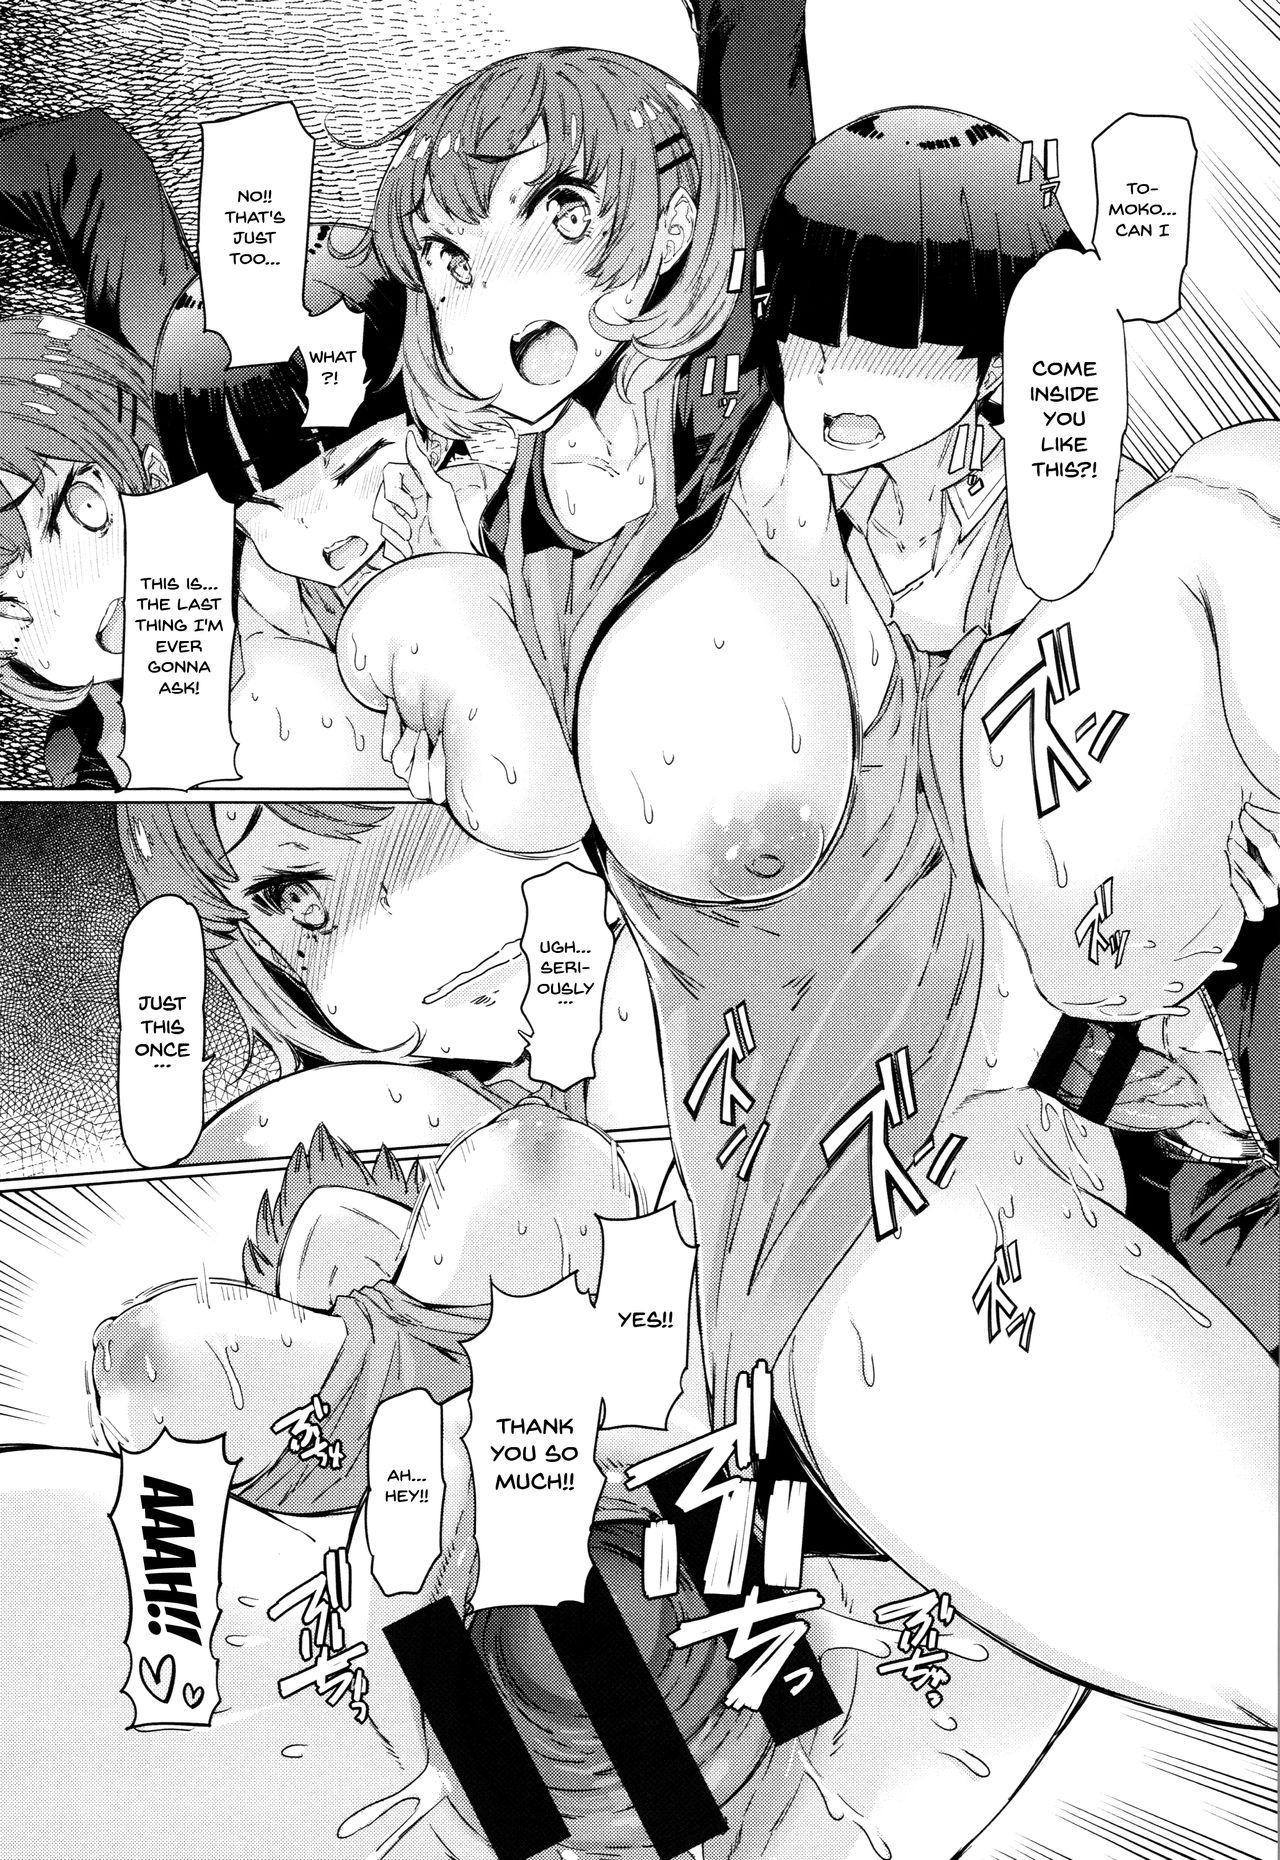 Hitozuma ga Ero Sugite Shigoto ni Naranai! | These Housewives Are Too Lewd I Can't Help It! 146